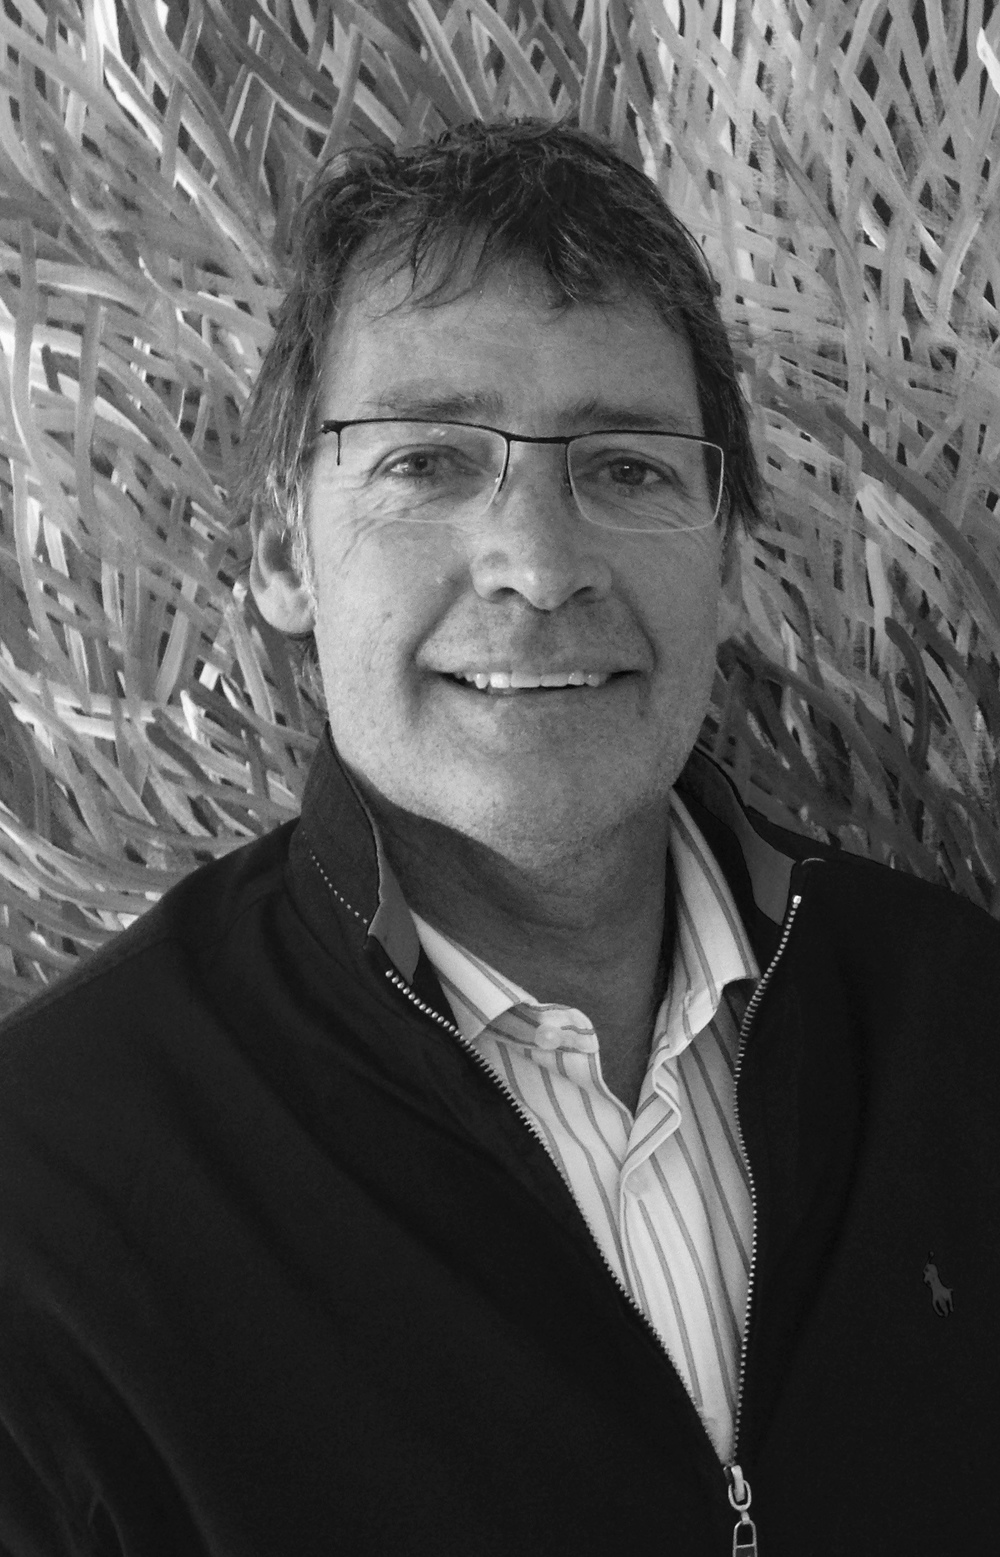 New Board member, Craig Turley